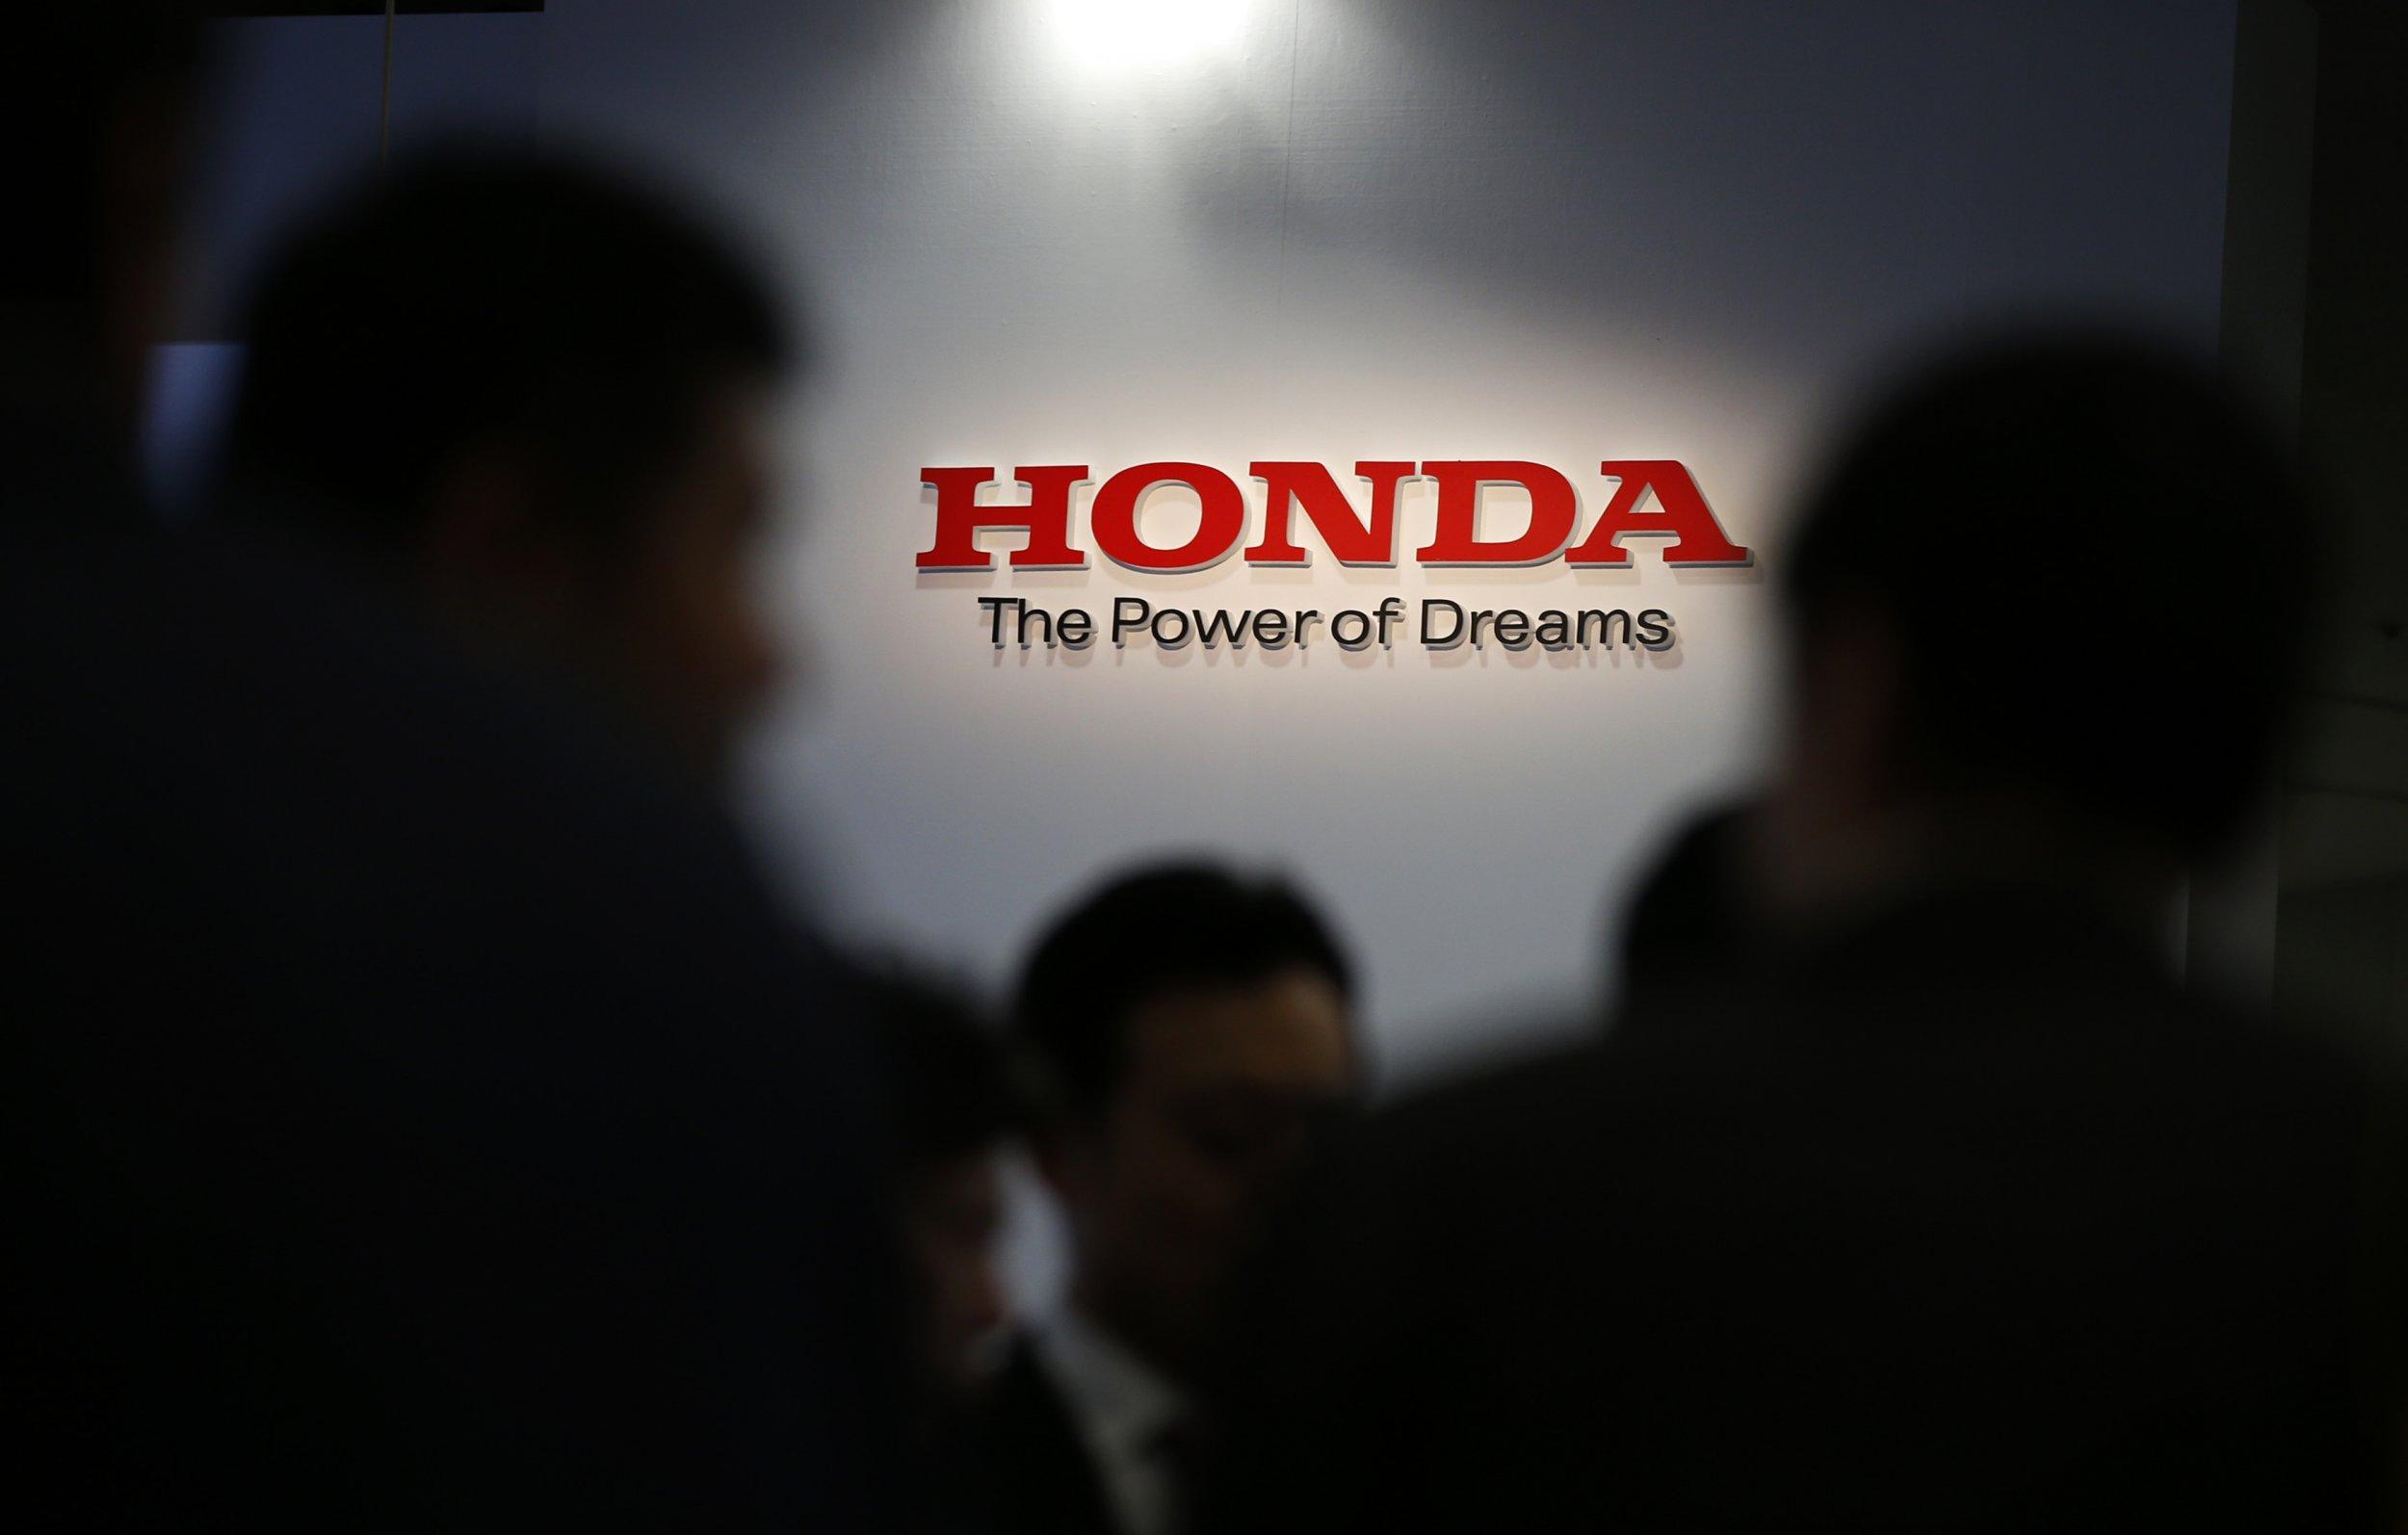 Honda, Mitsubishi Implicated in Emissions Tests